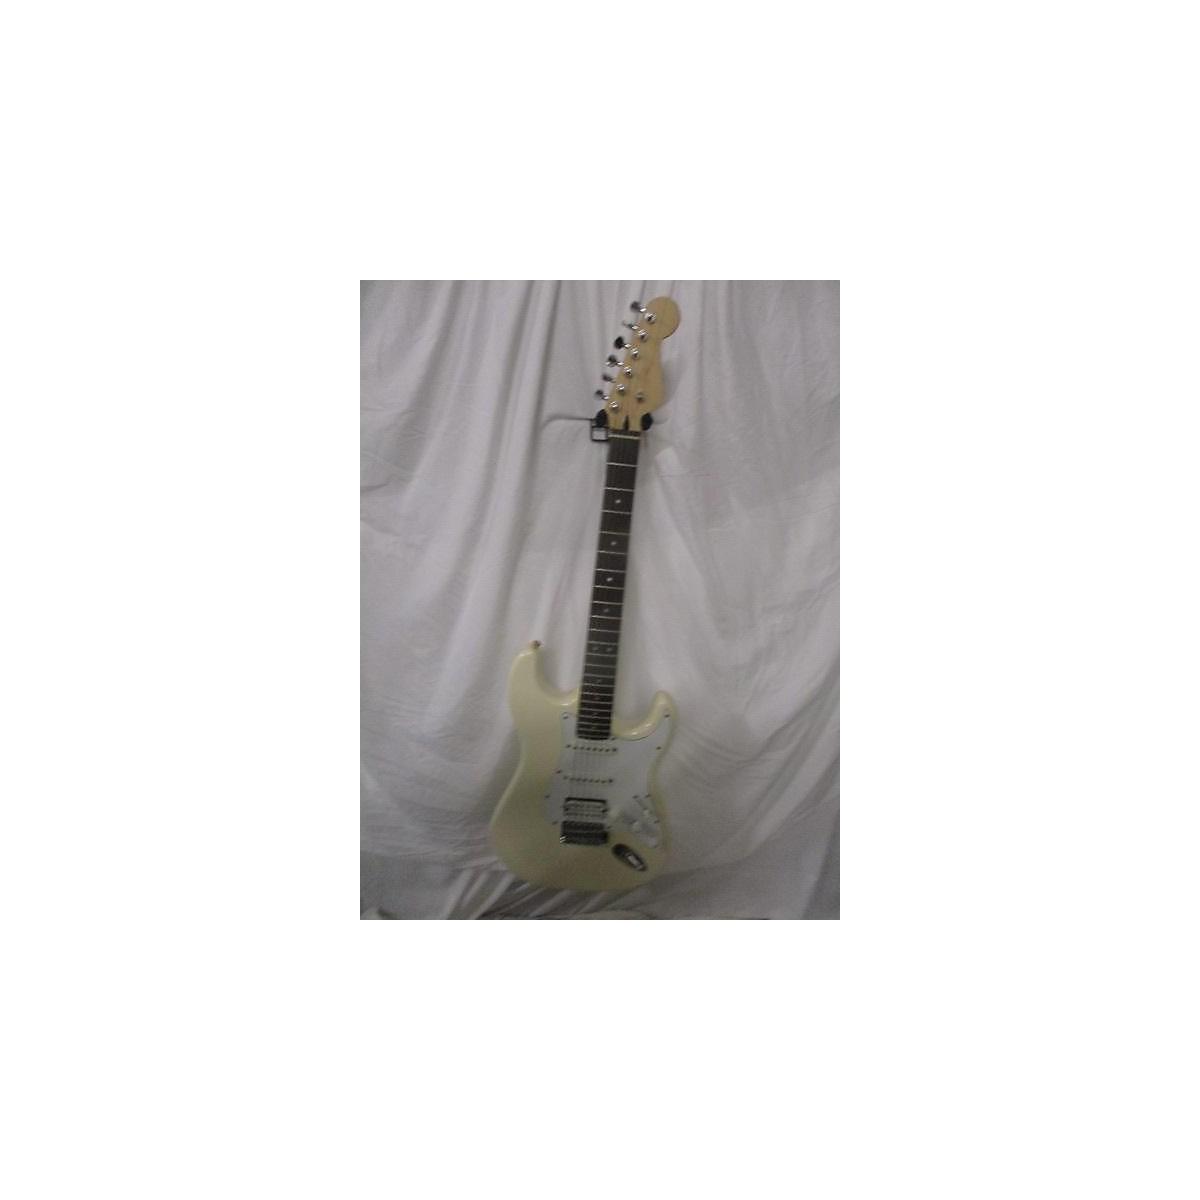 Fernandes Partscaster Solid Body Electric Guitar